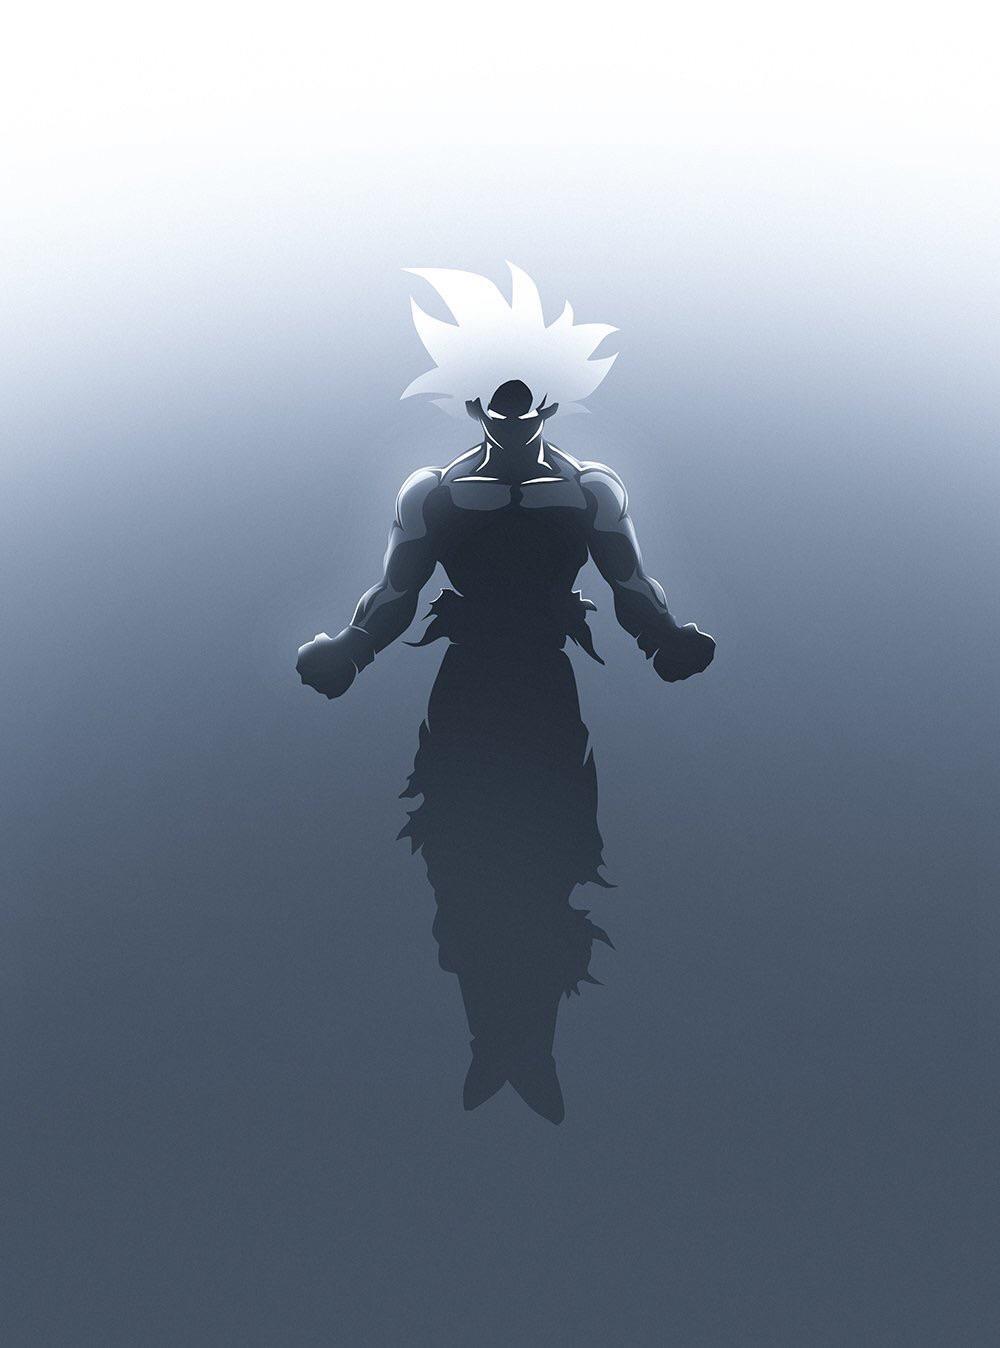 Imagegoku Goku Ultra Instinct Wallpaper 4k 9210 Hd